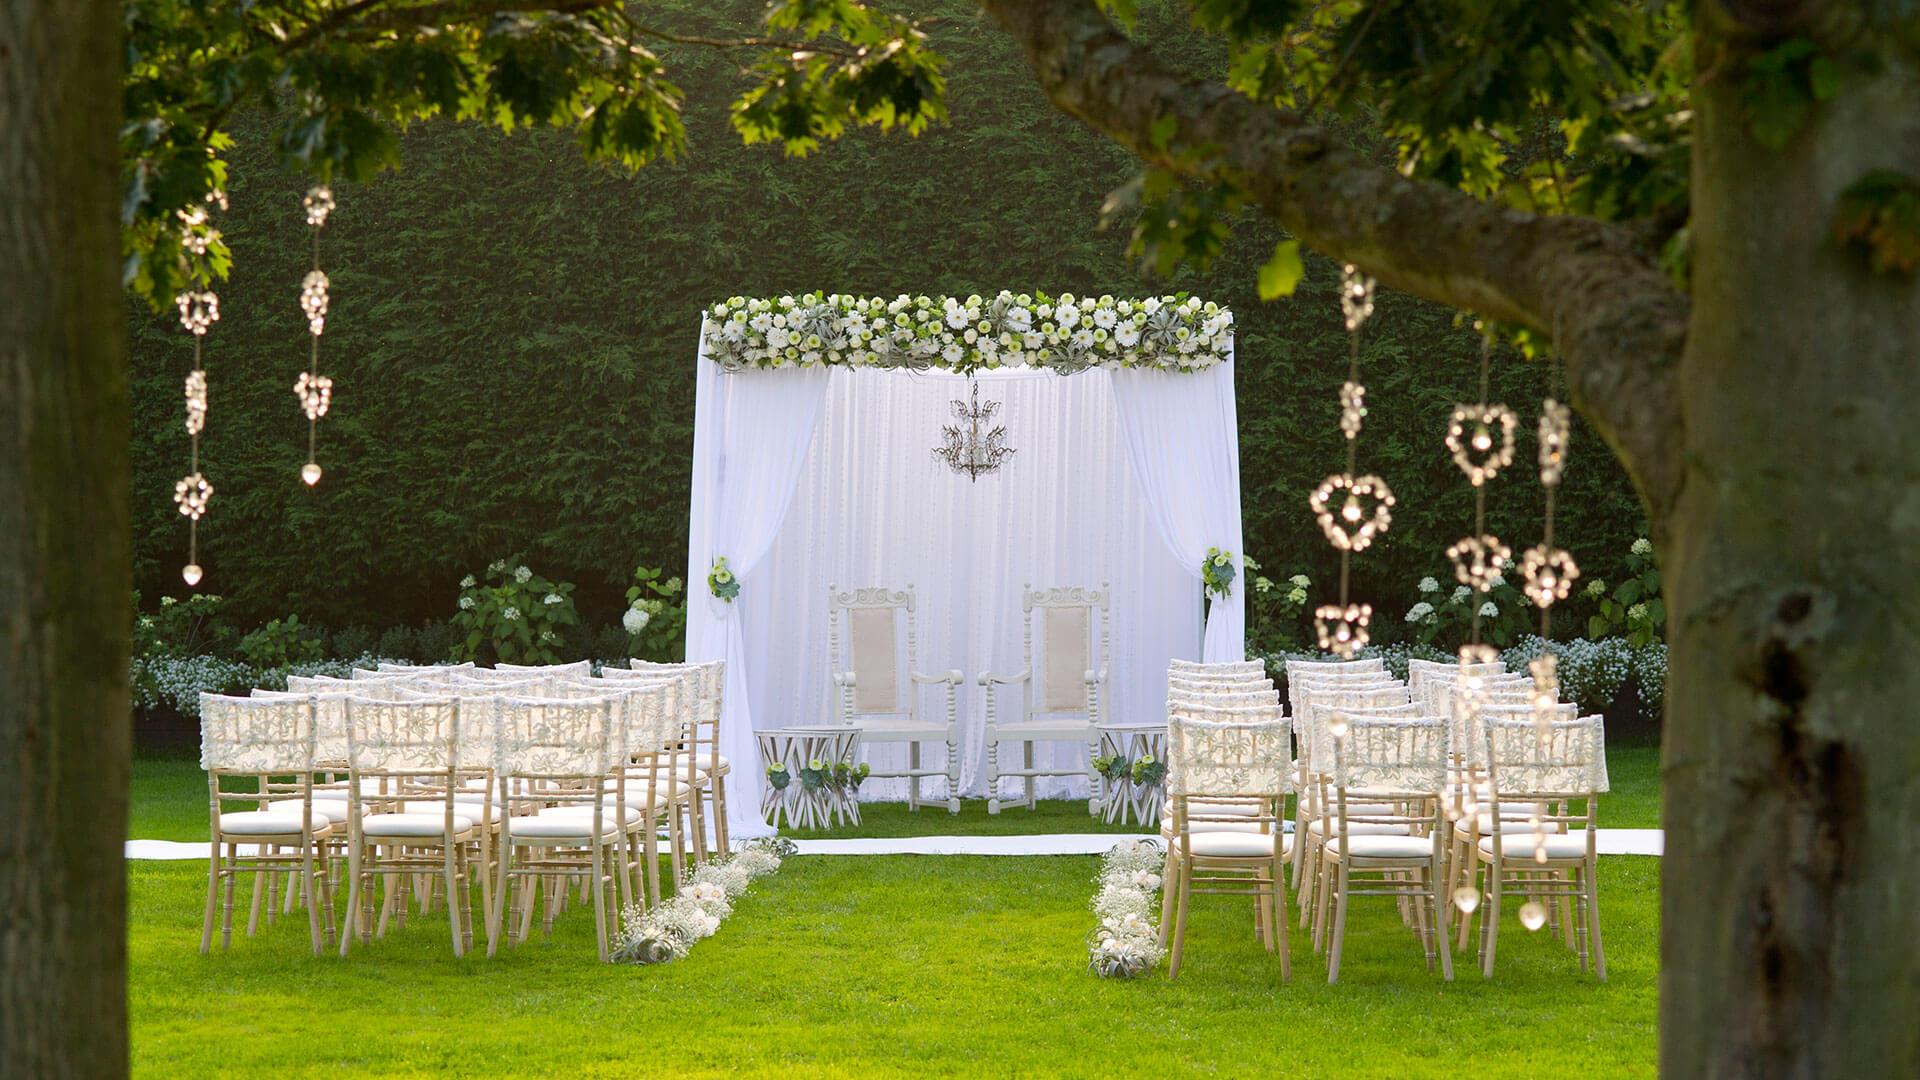 Outdoor Wedding Venue In Epping, Essex